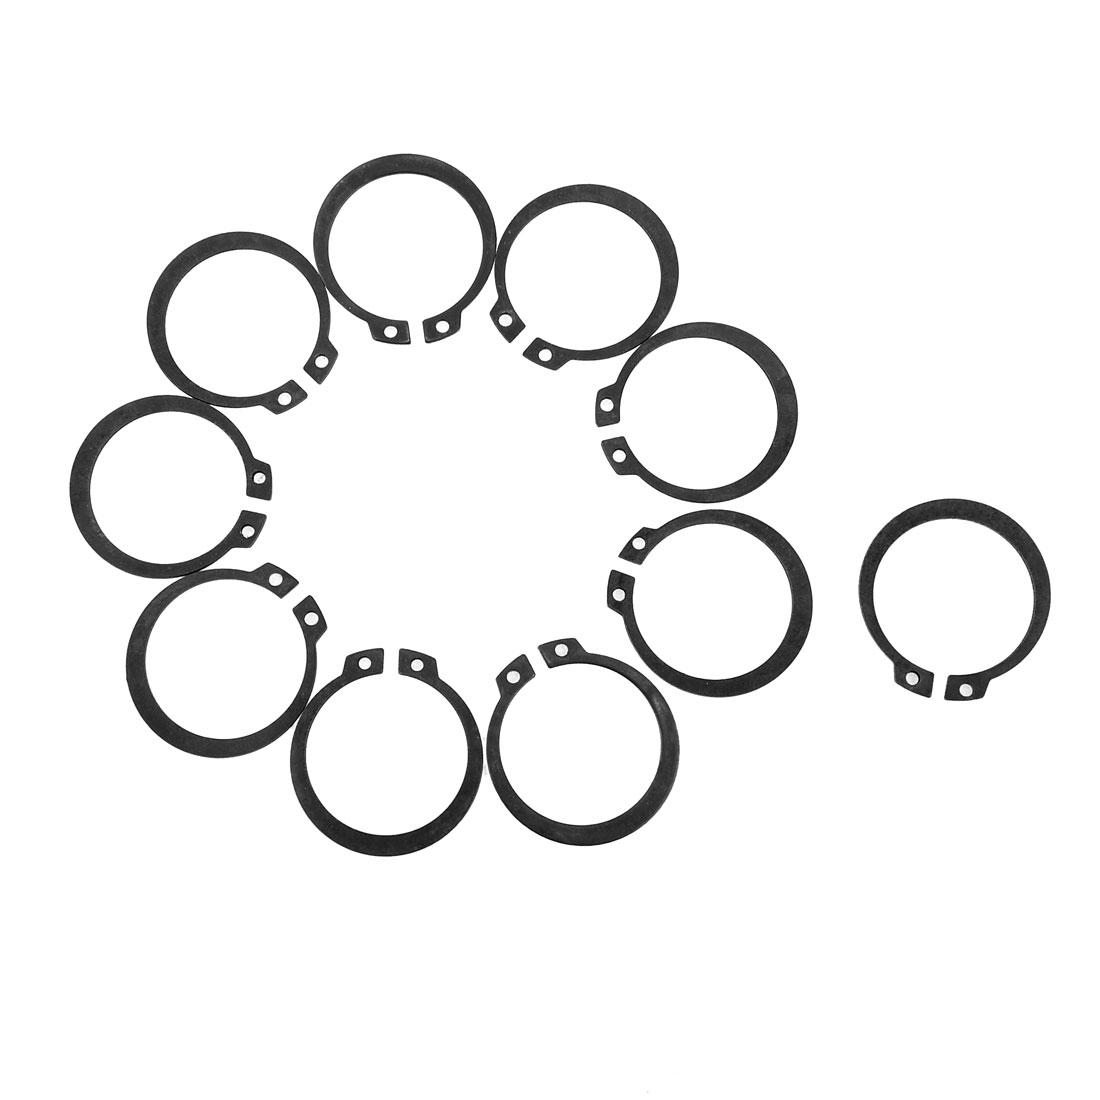 10 Pcs Axle Shaft Metal Inner Dia 33mm External Circlip Snap Ring